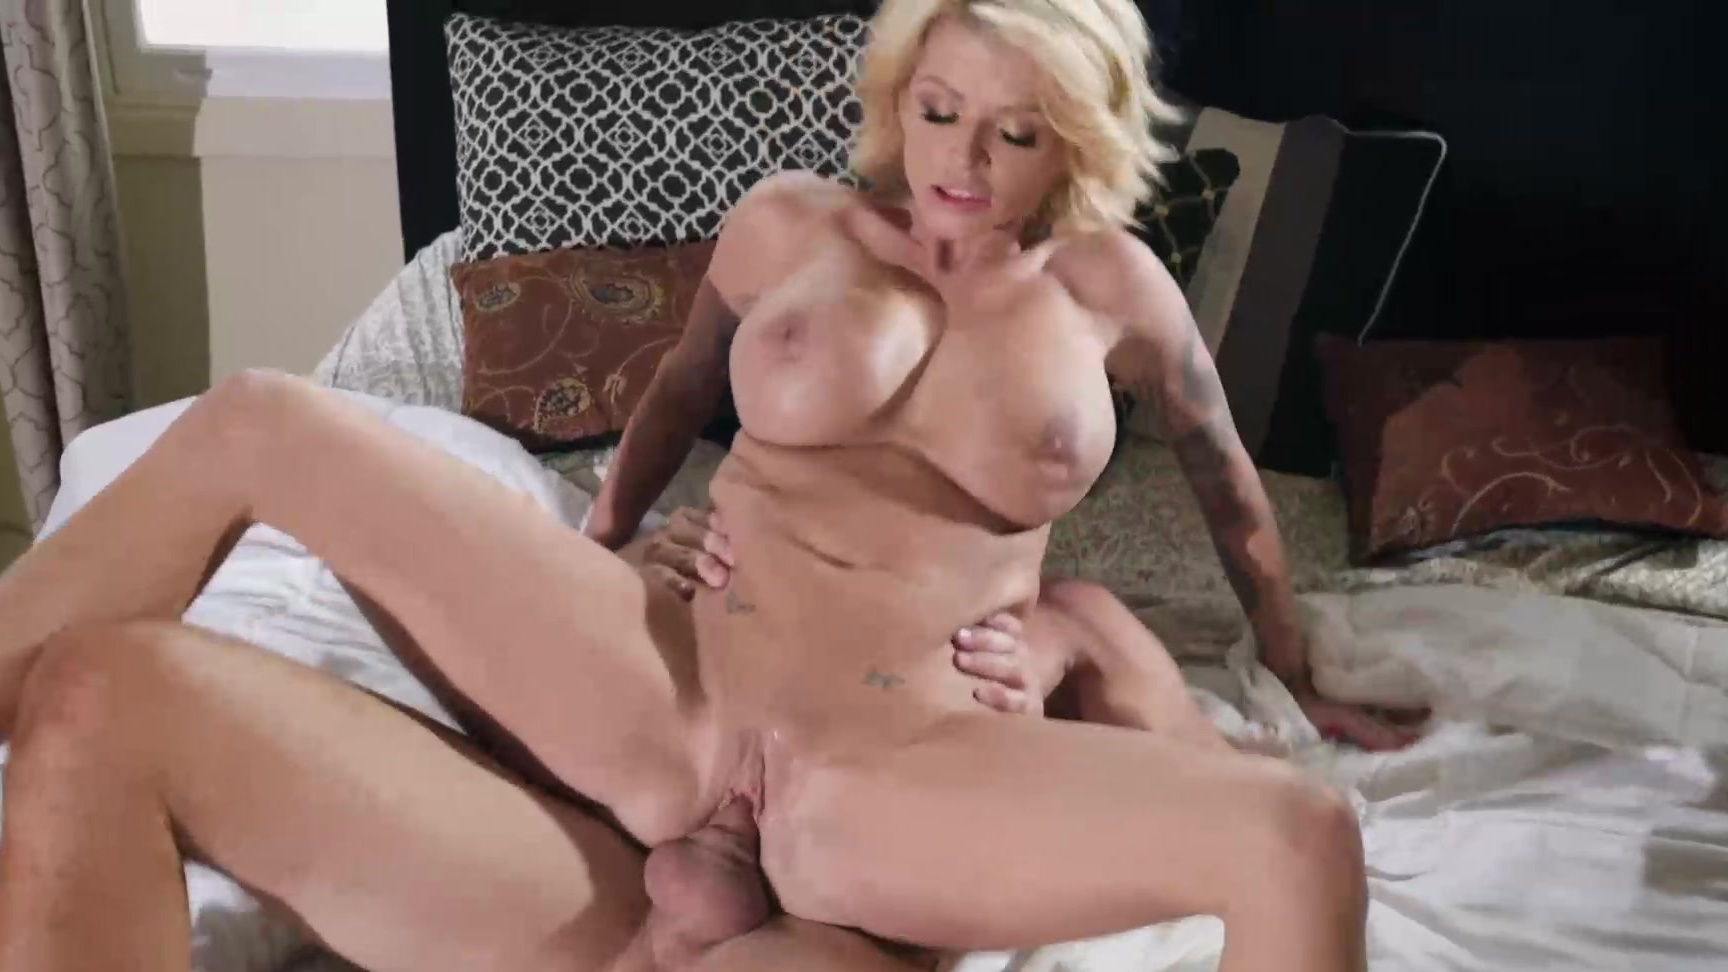 St pete fl girls porn